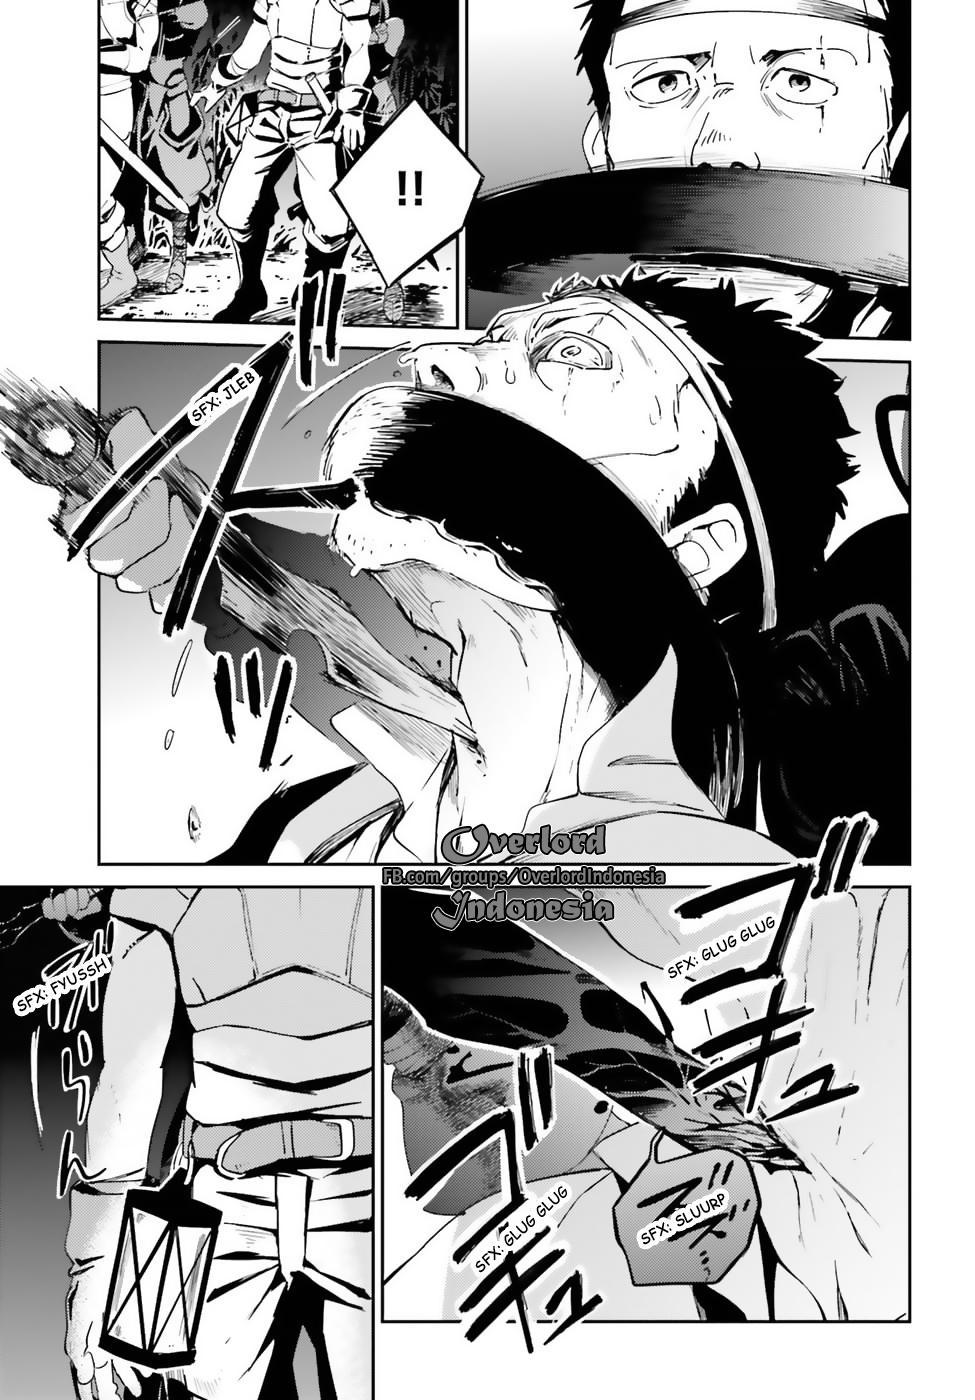 Baca Komik Overlord chapter 28 Bahasa Indonesia